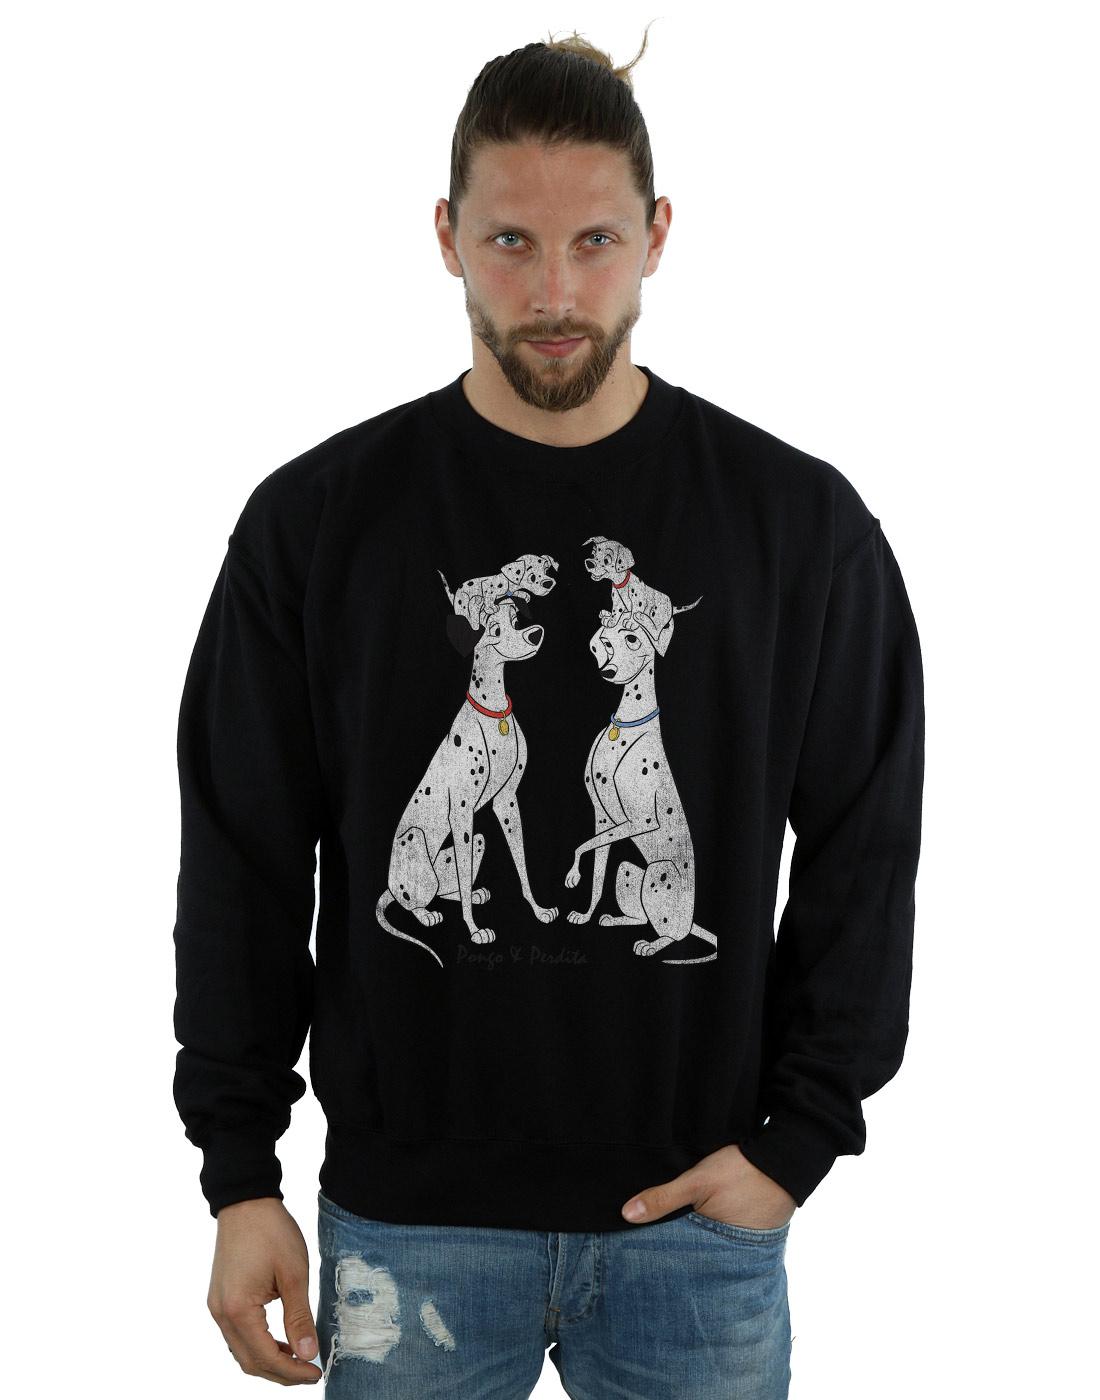 Disney hombre 101 Dalmatians Classic Pongo and Perdita Camiseta PJvXOje2